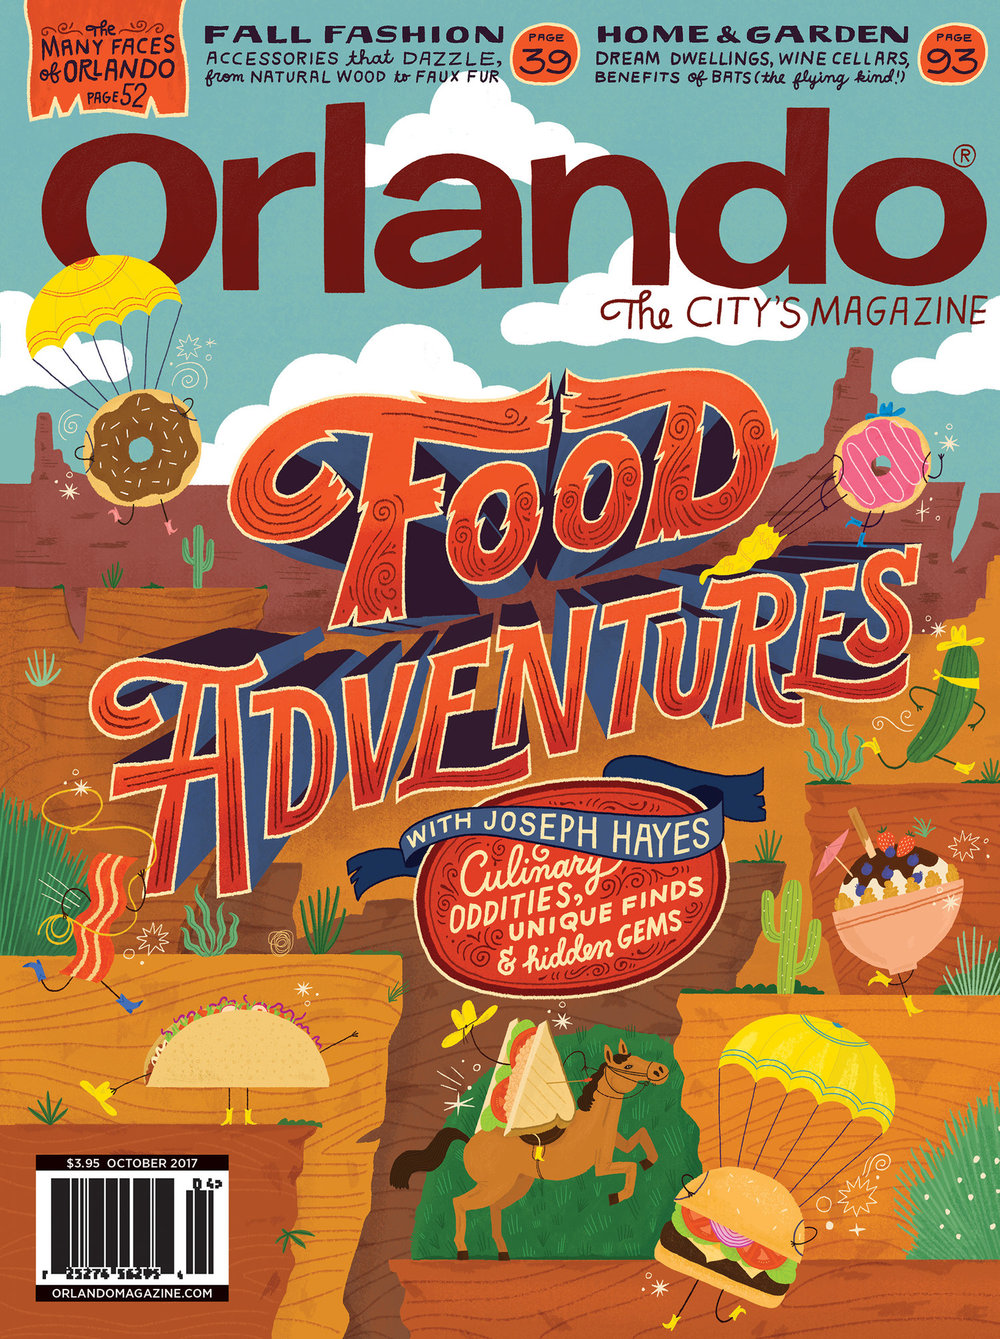 OrlandoMagazine_MaryKateMcDevitt.jpg